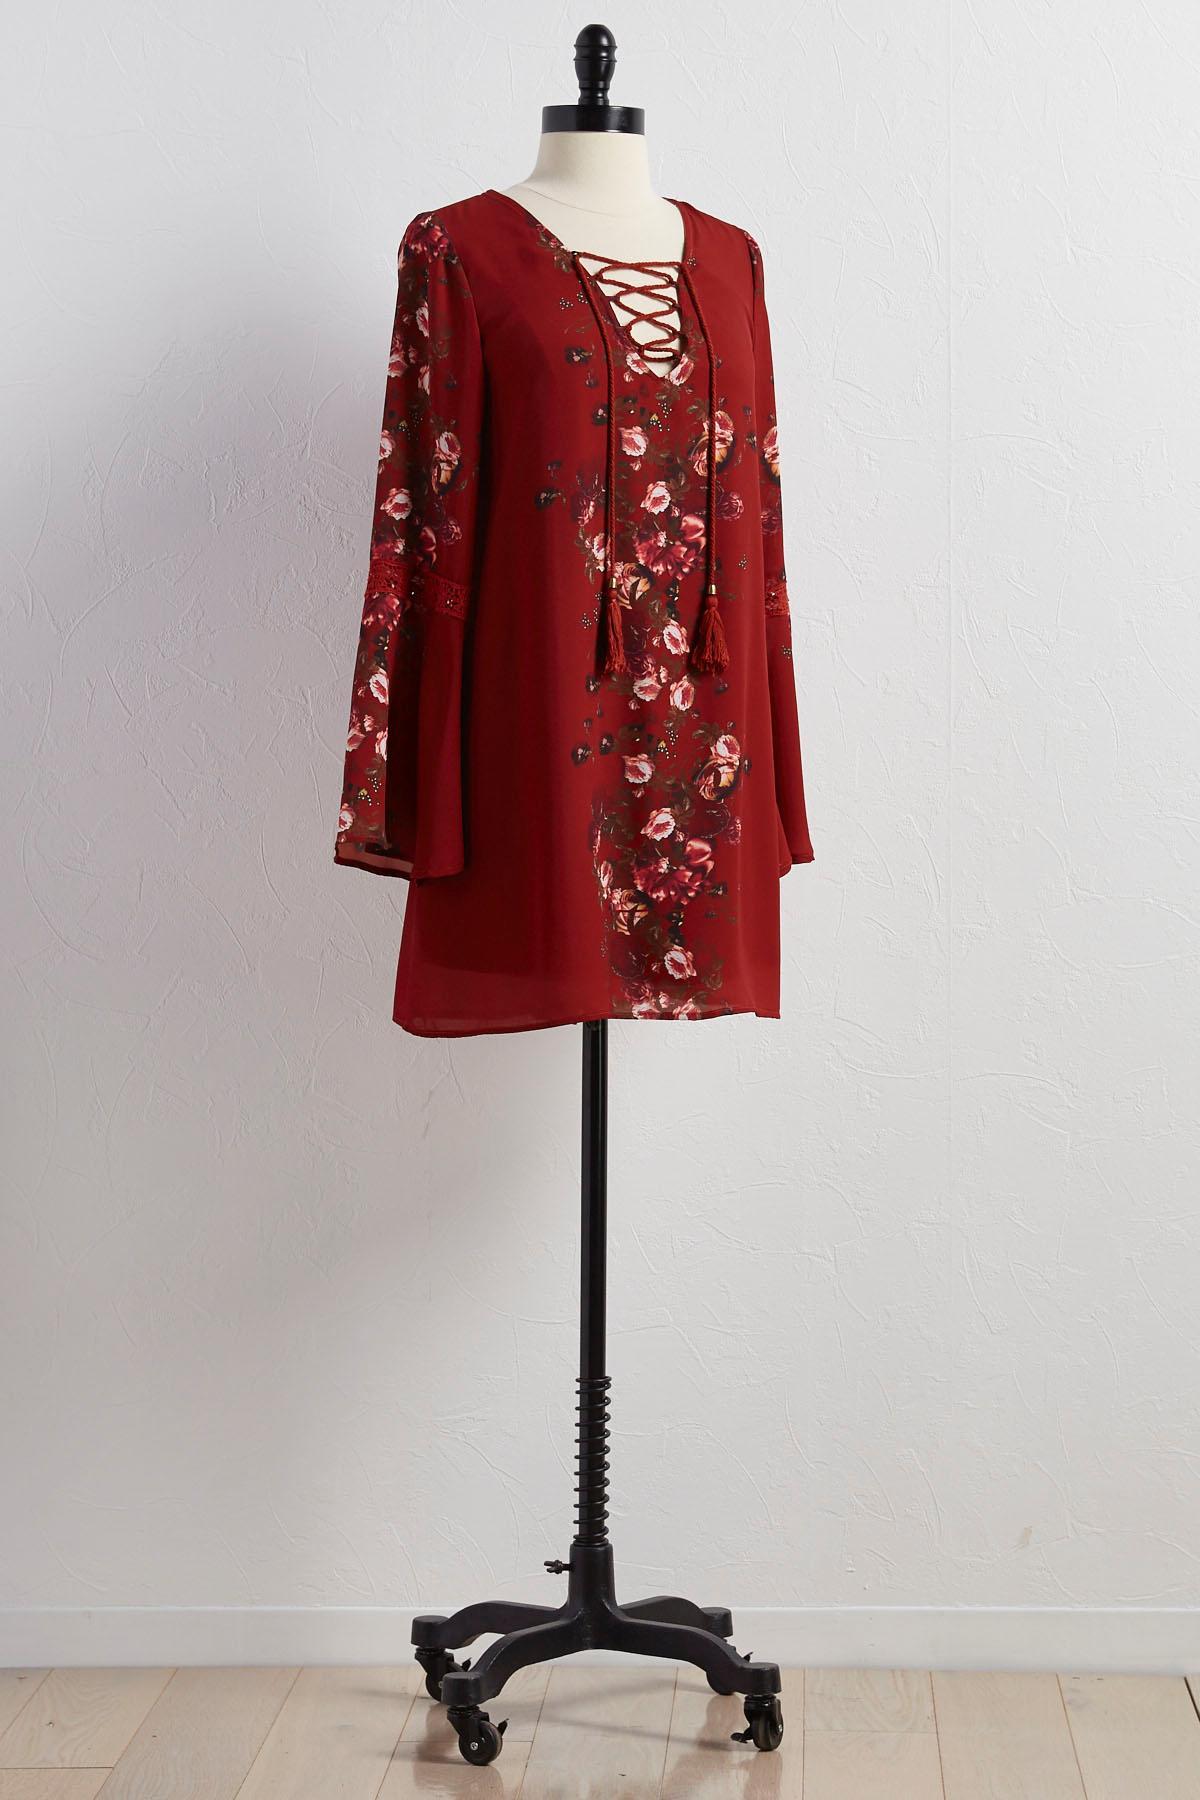 Floral Lace Up Neck Shift Dress